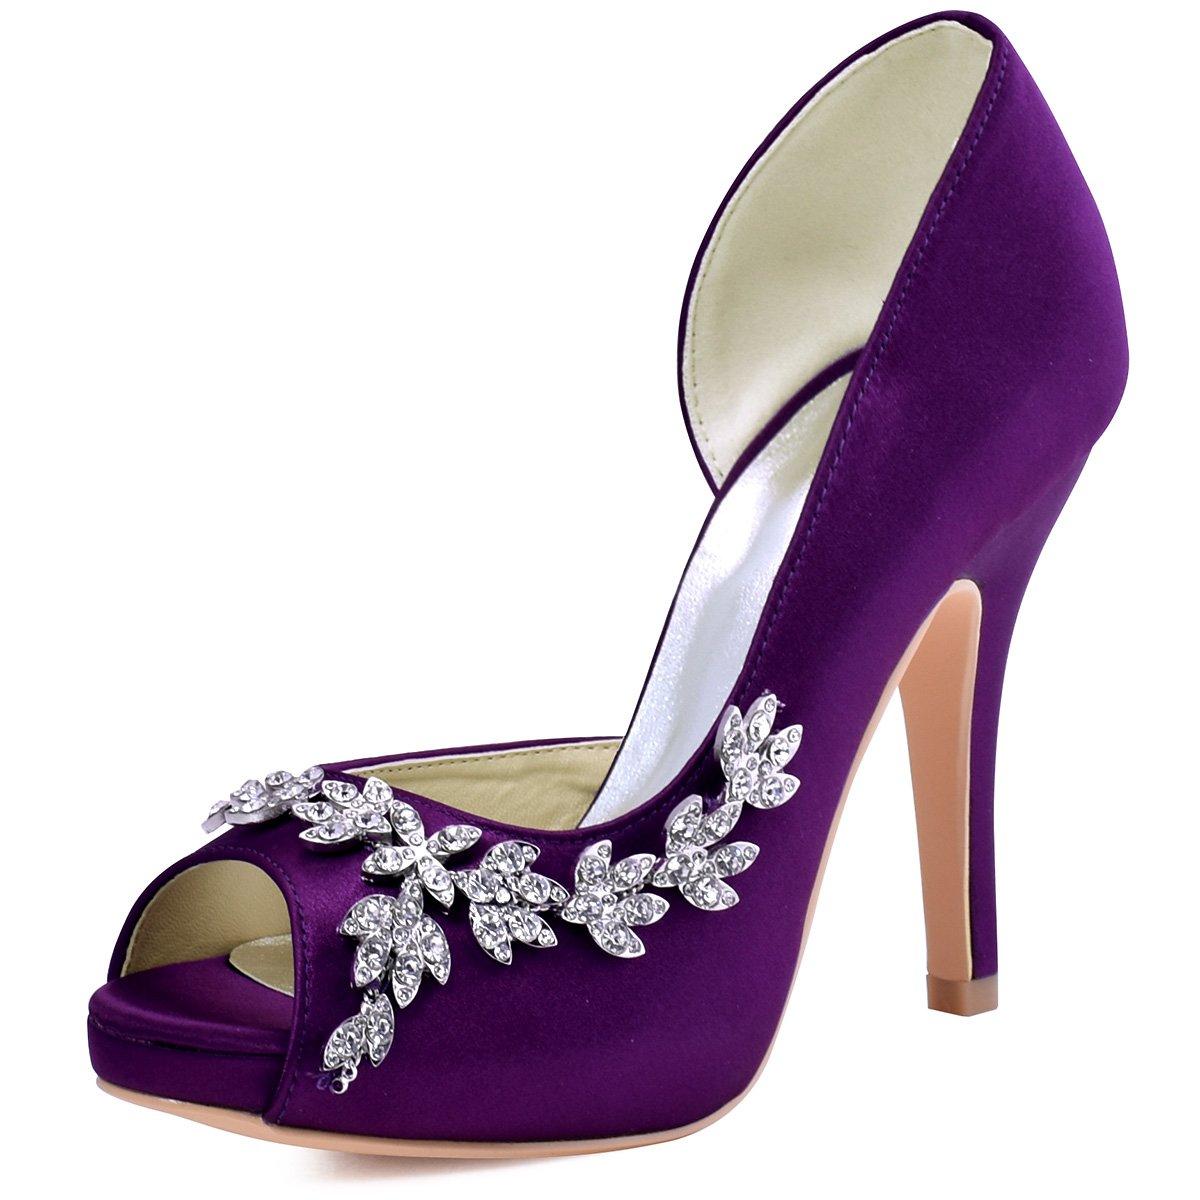 Elegantpark EP11045-IP Mujer Plataforma Peep Toe Tacón Aguja Arcos Satin Zapatos de Boda Novia 41 EU|Ac01 Morado